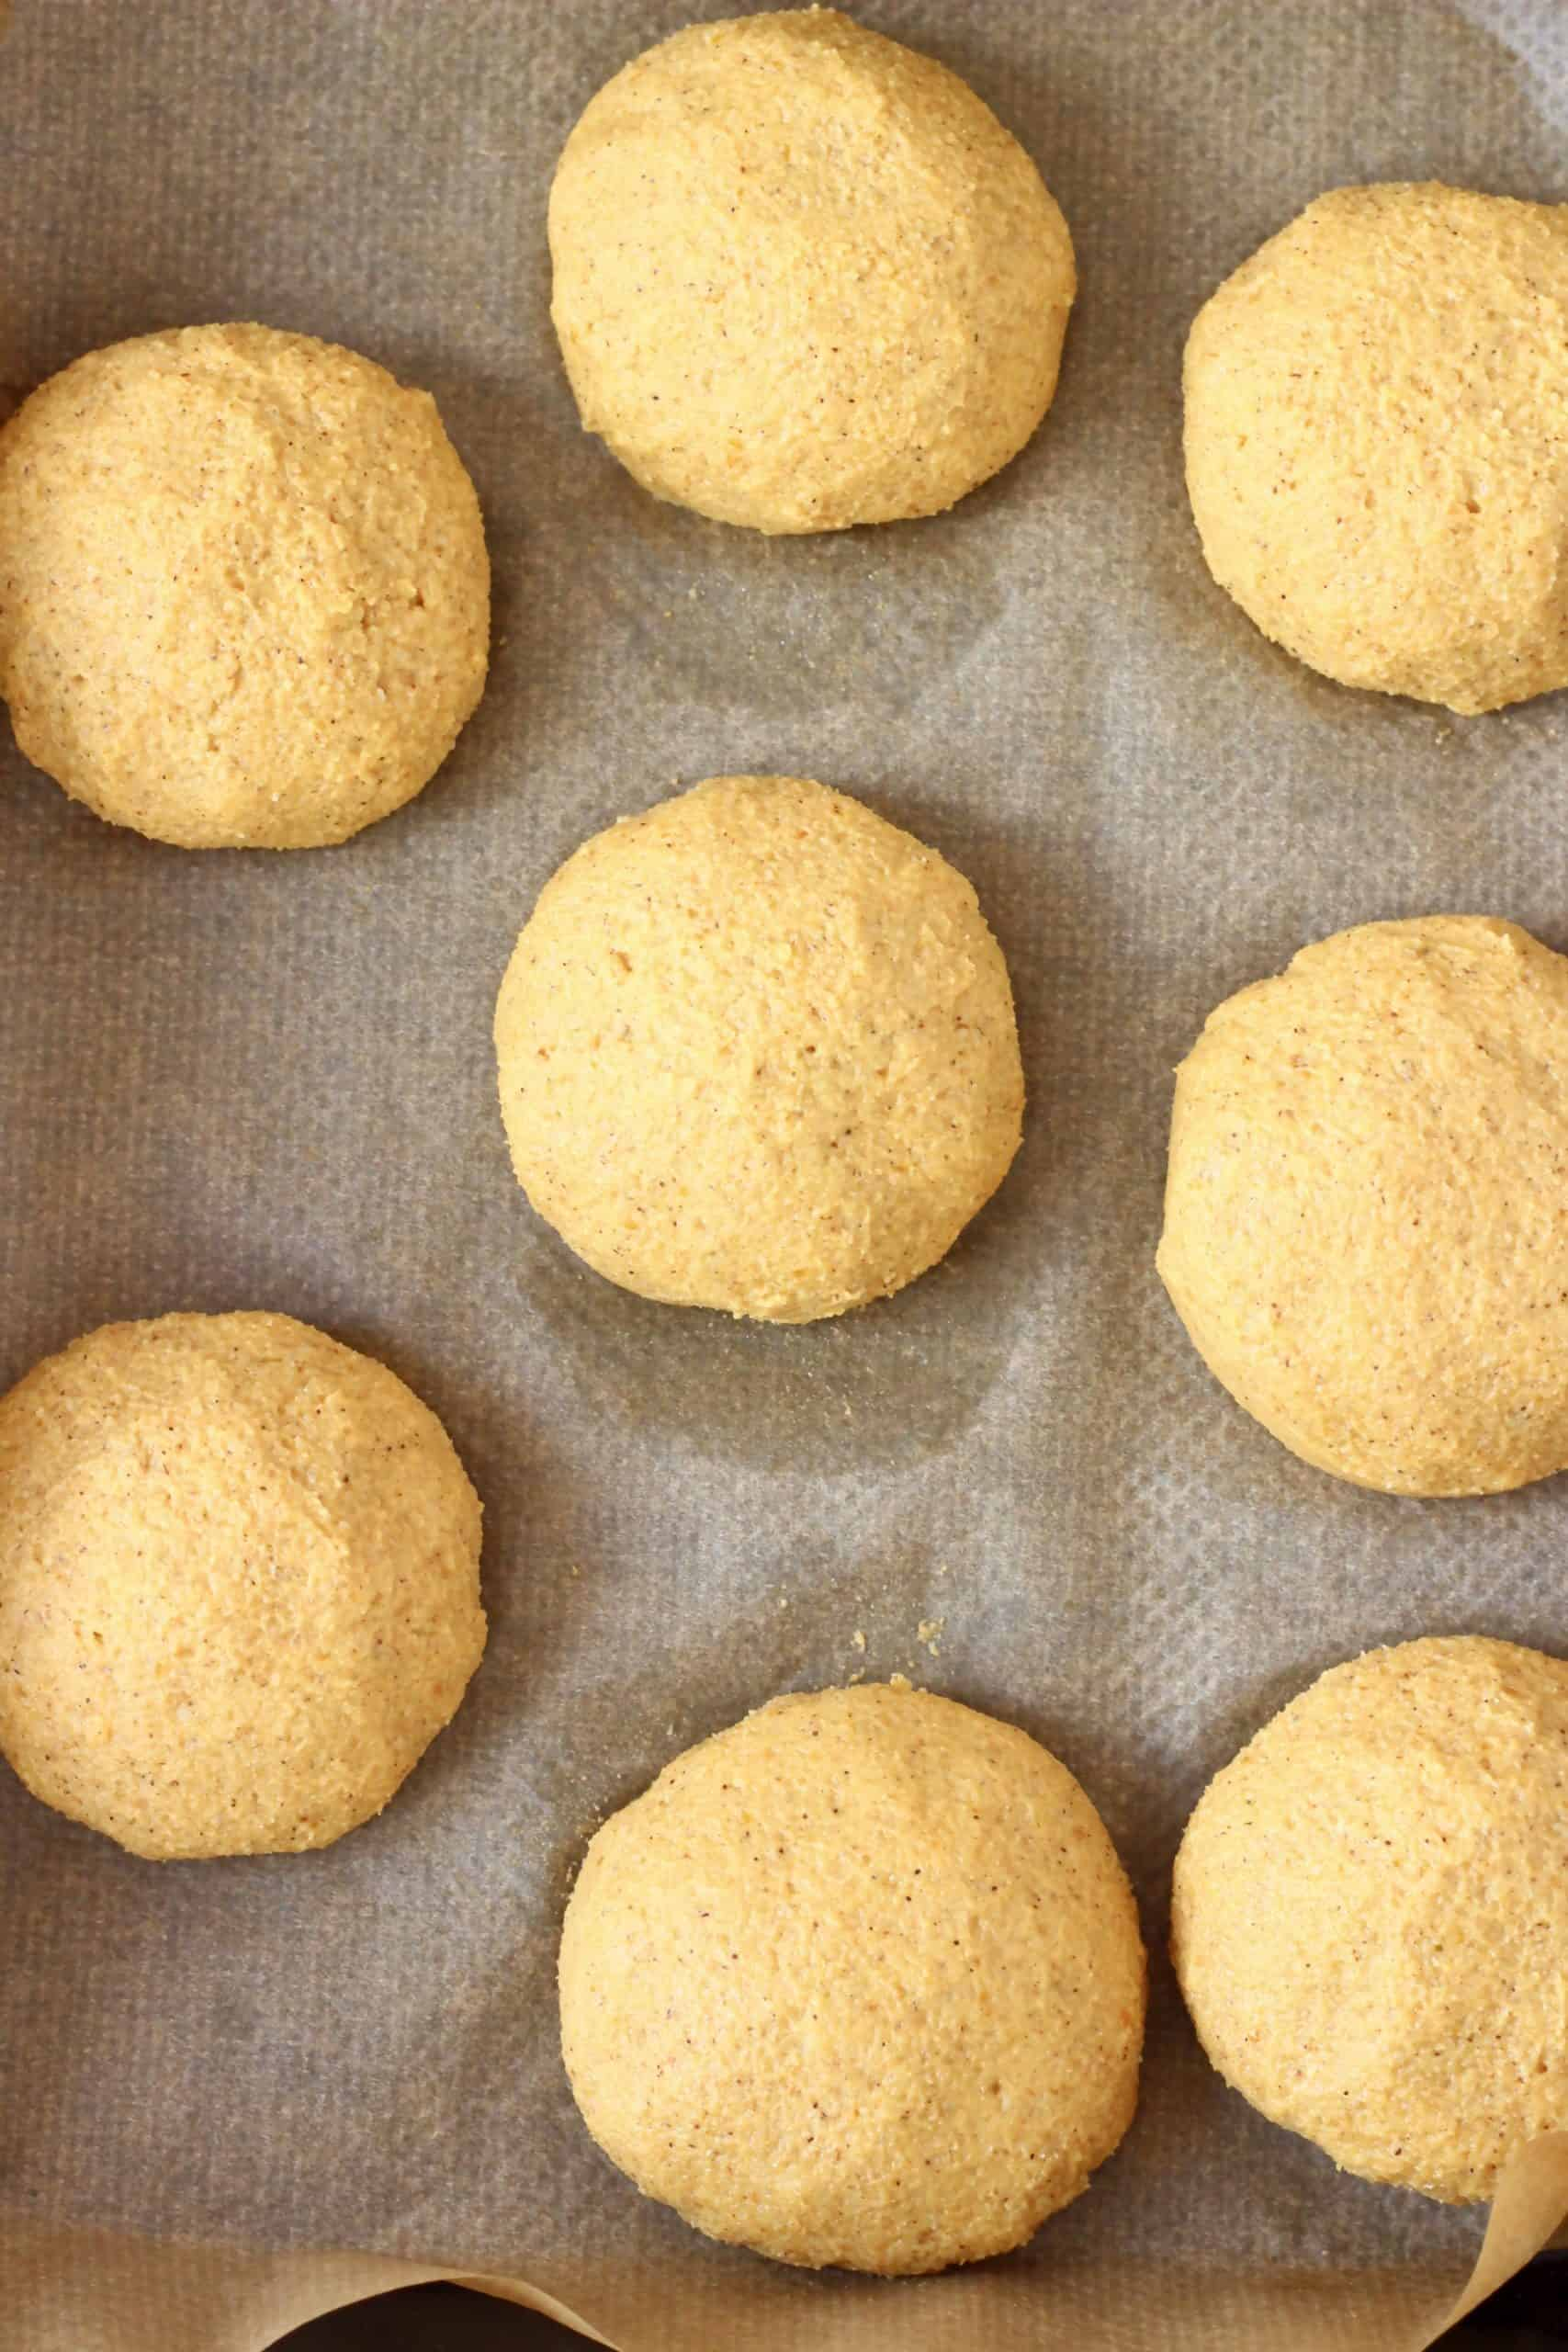 Eight raw gluten-free vegan pumpkin cookies on a baking tray